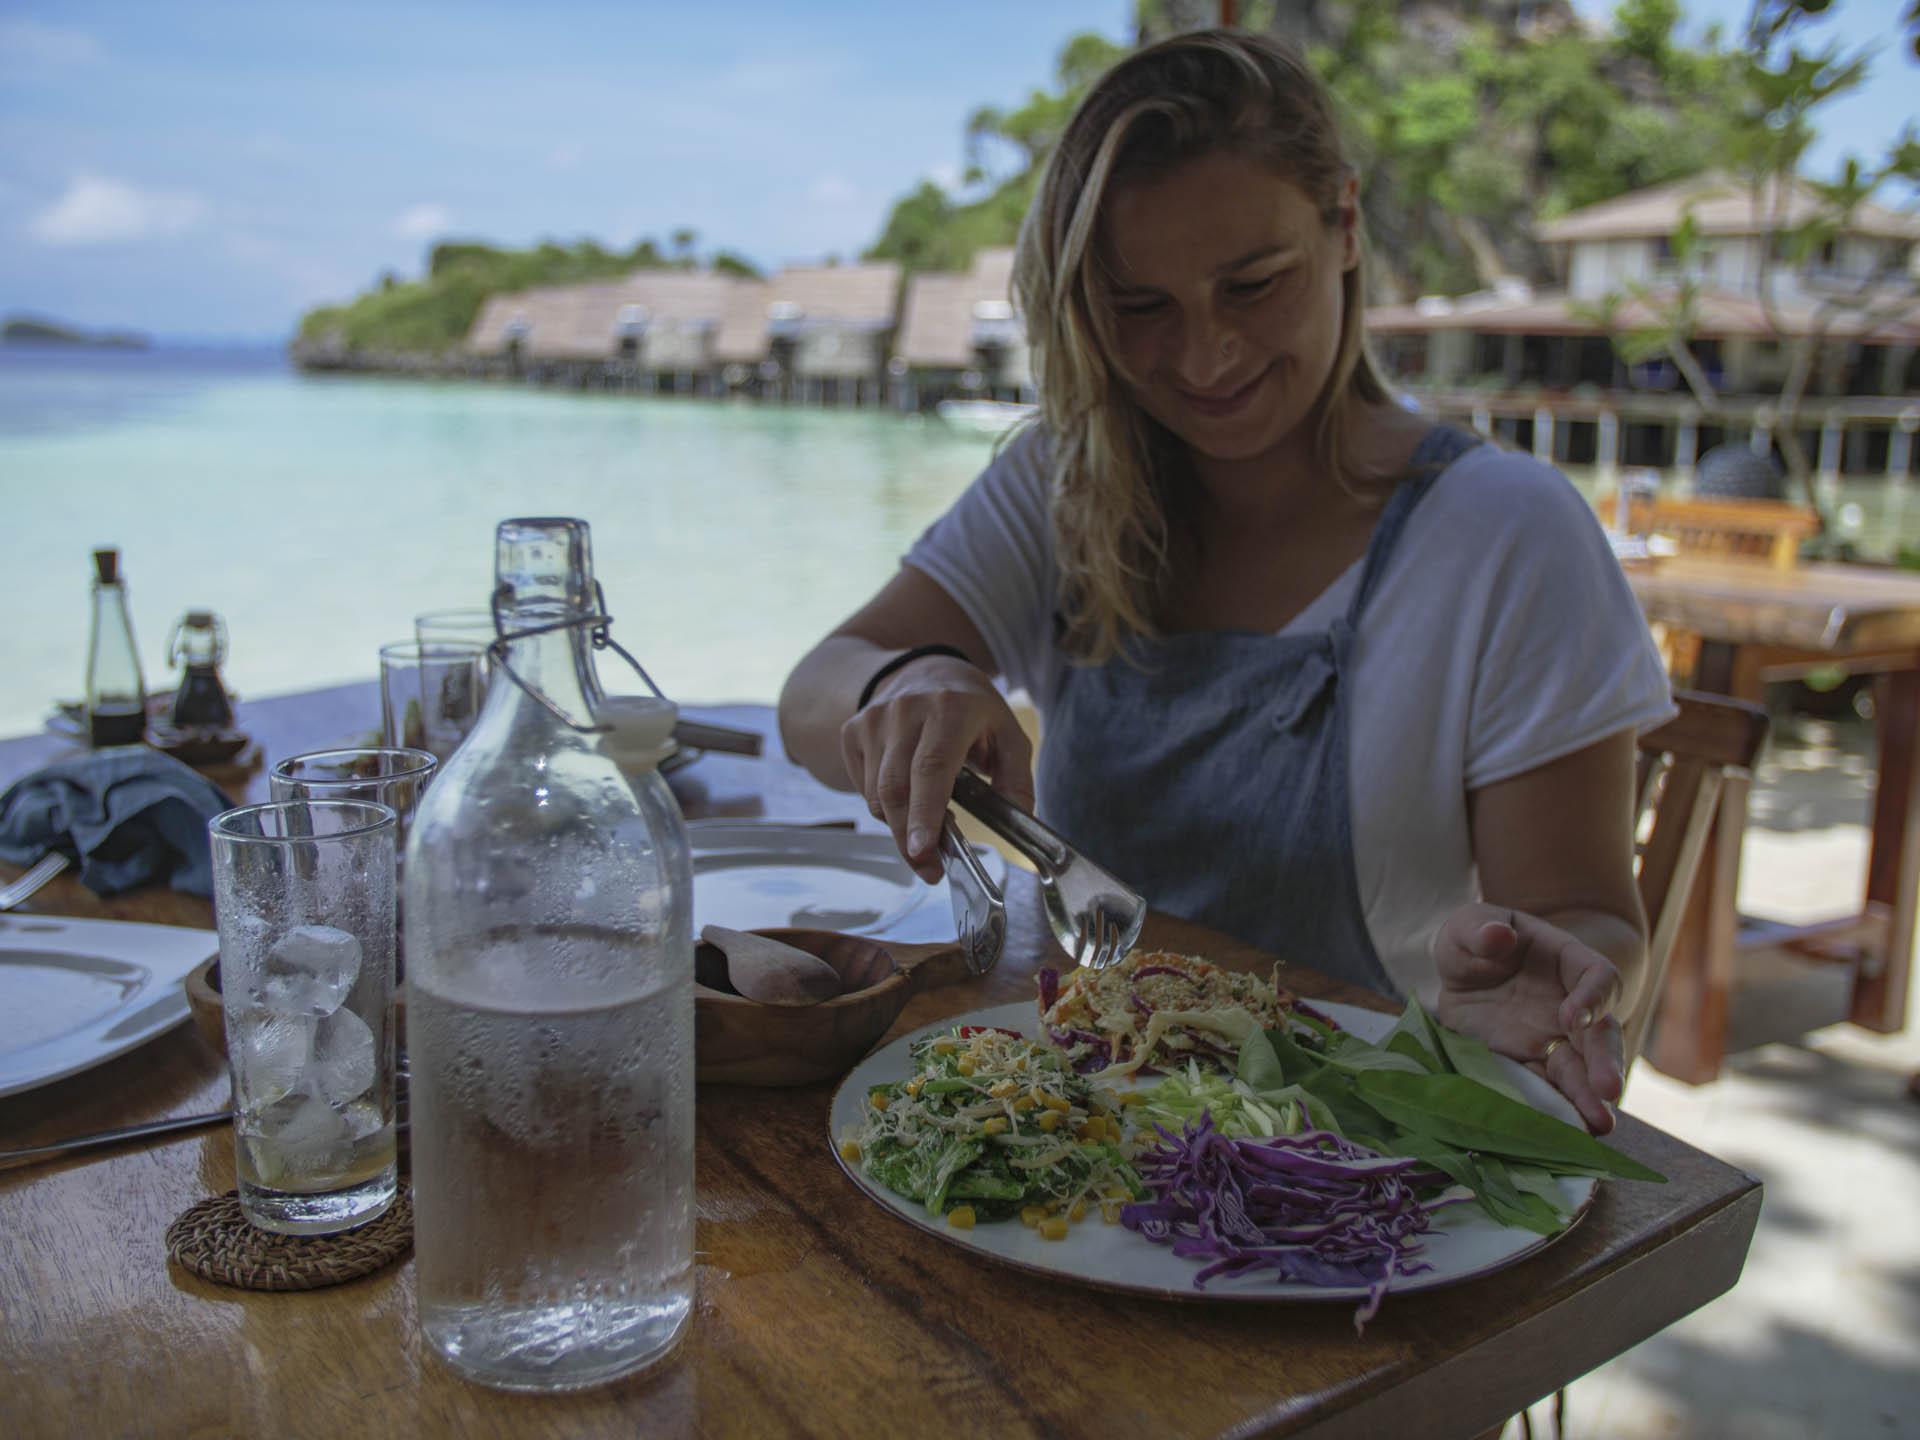 Snorkeling guest admiring the fantastic food at misool resort.